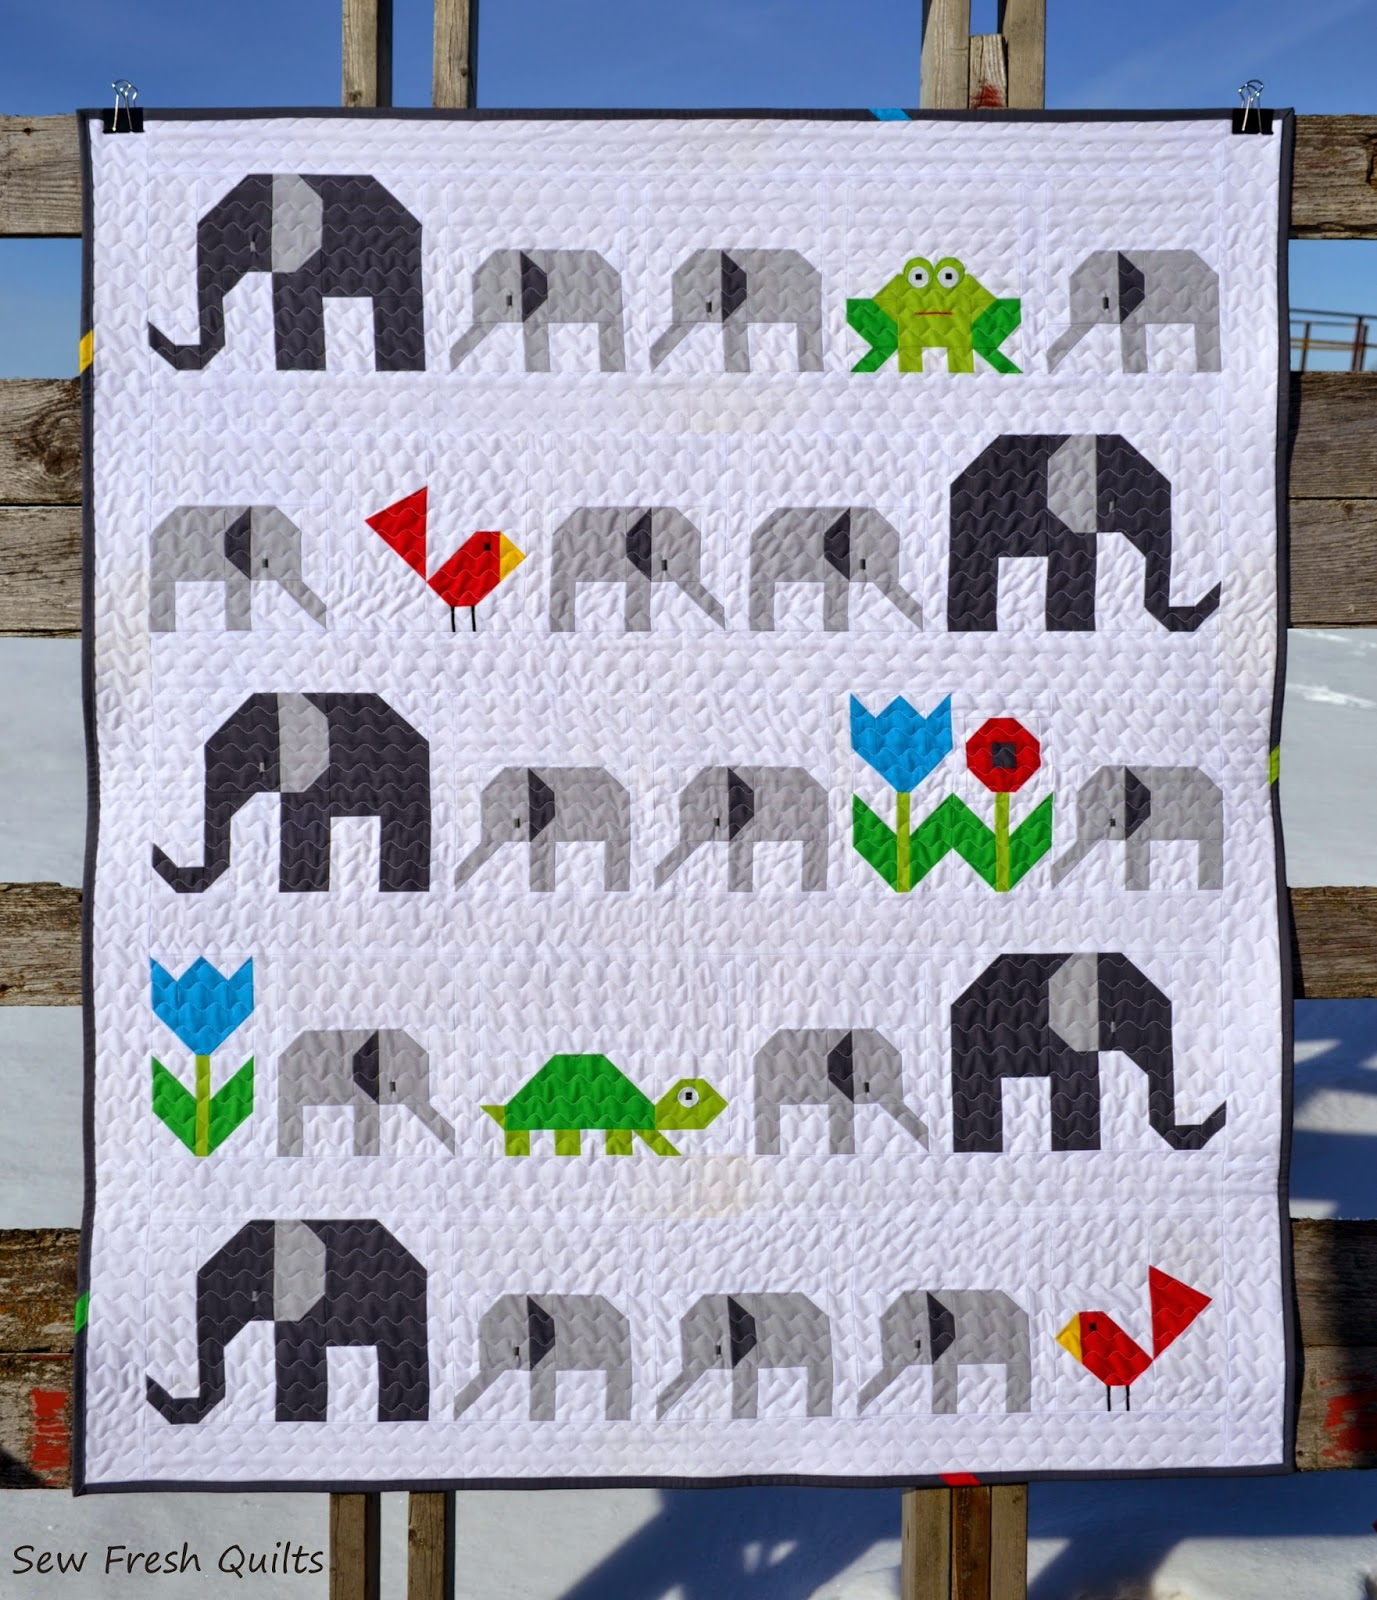 http://sewfreshquilts.blogspot.ca/2015/01/elephant-parade.html